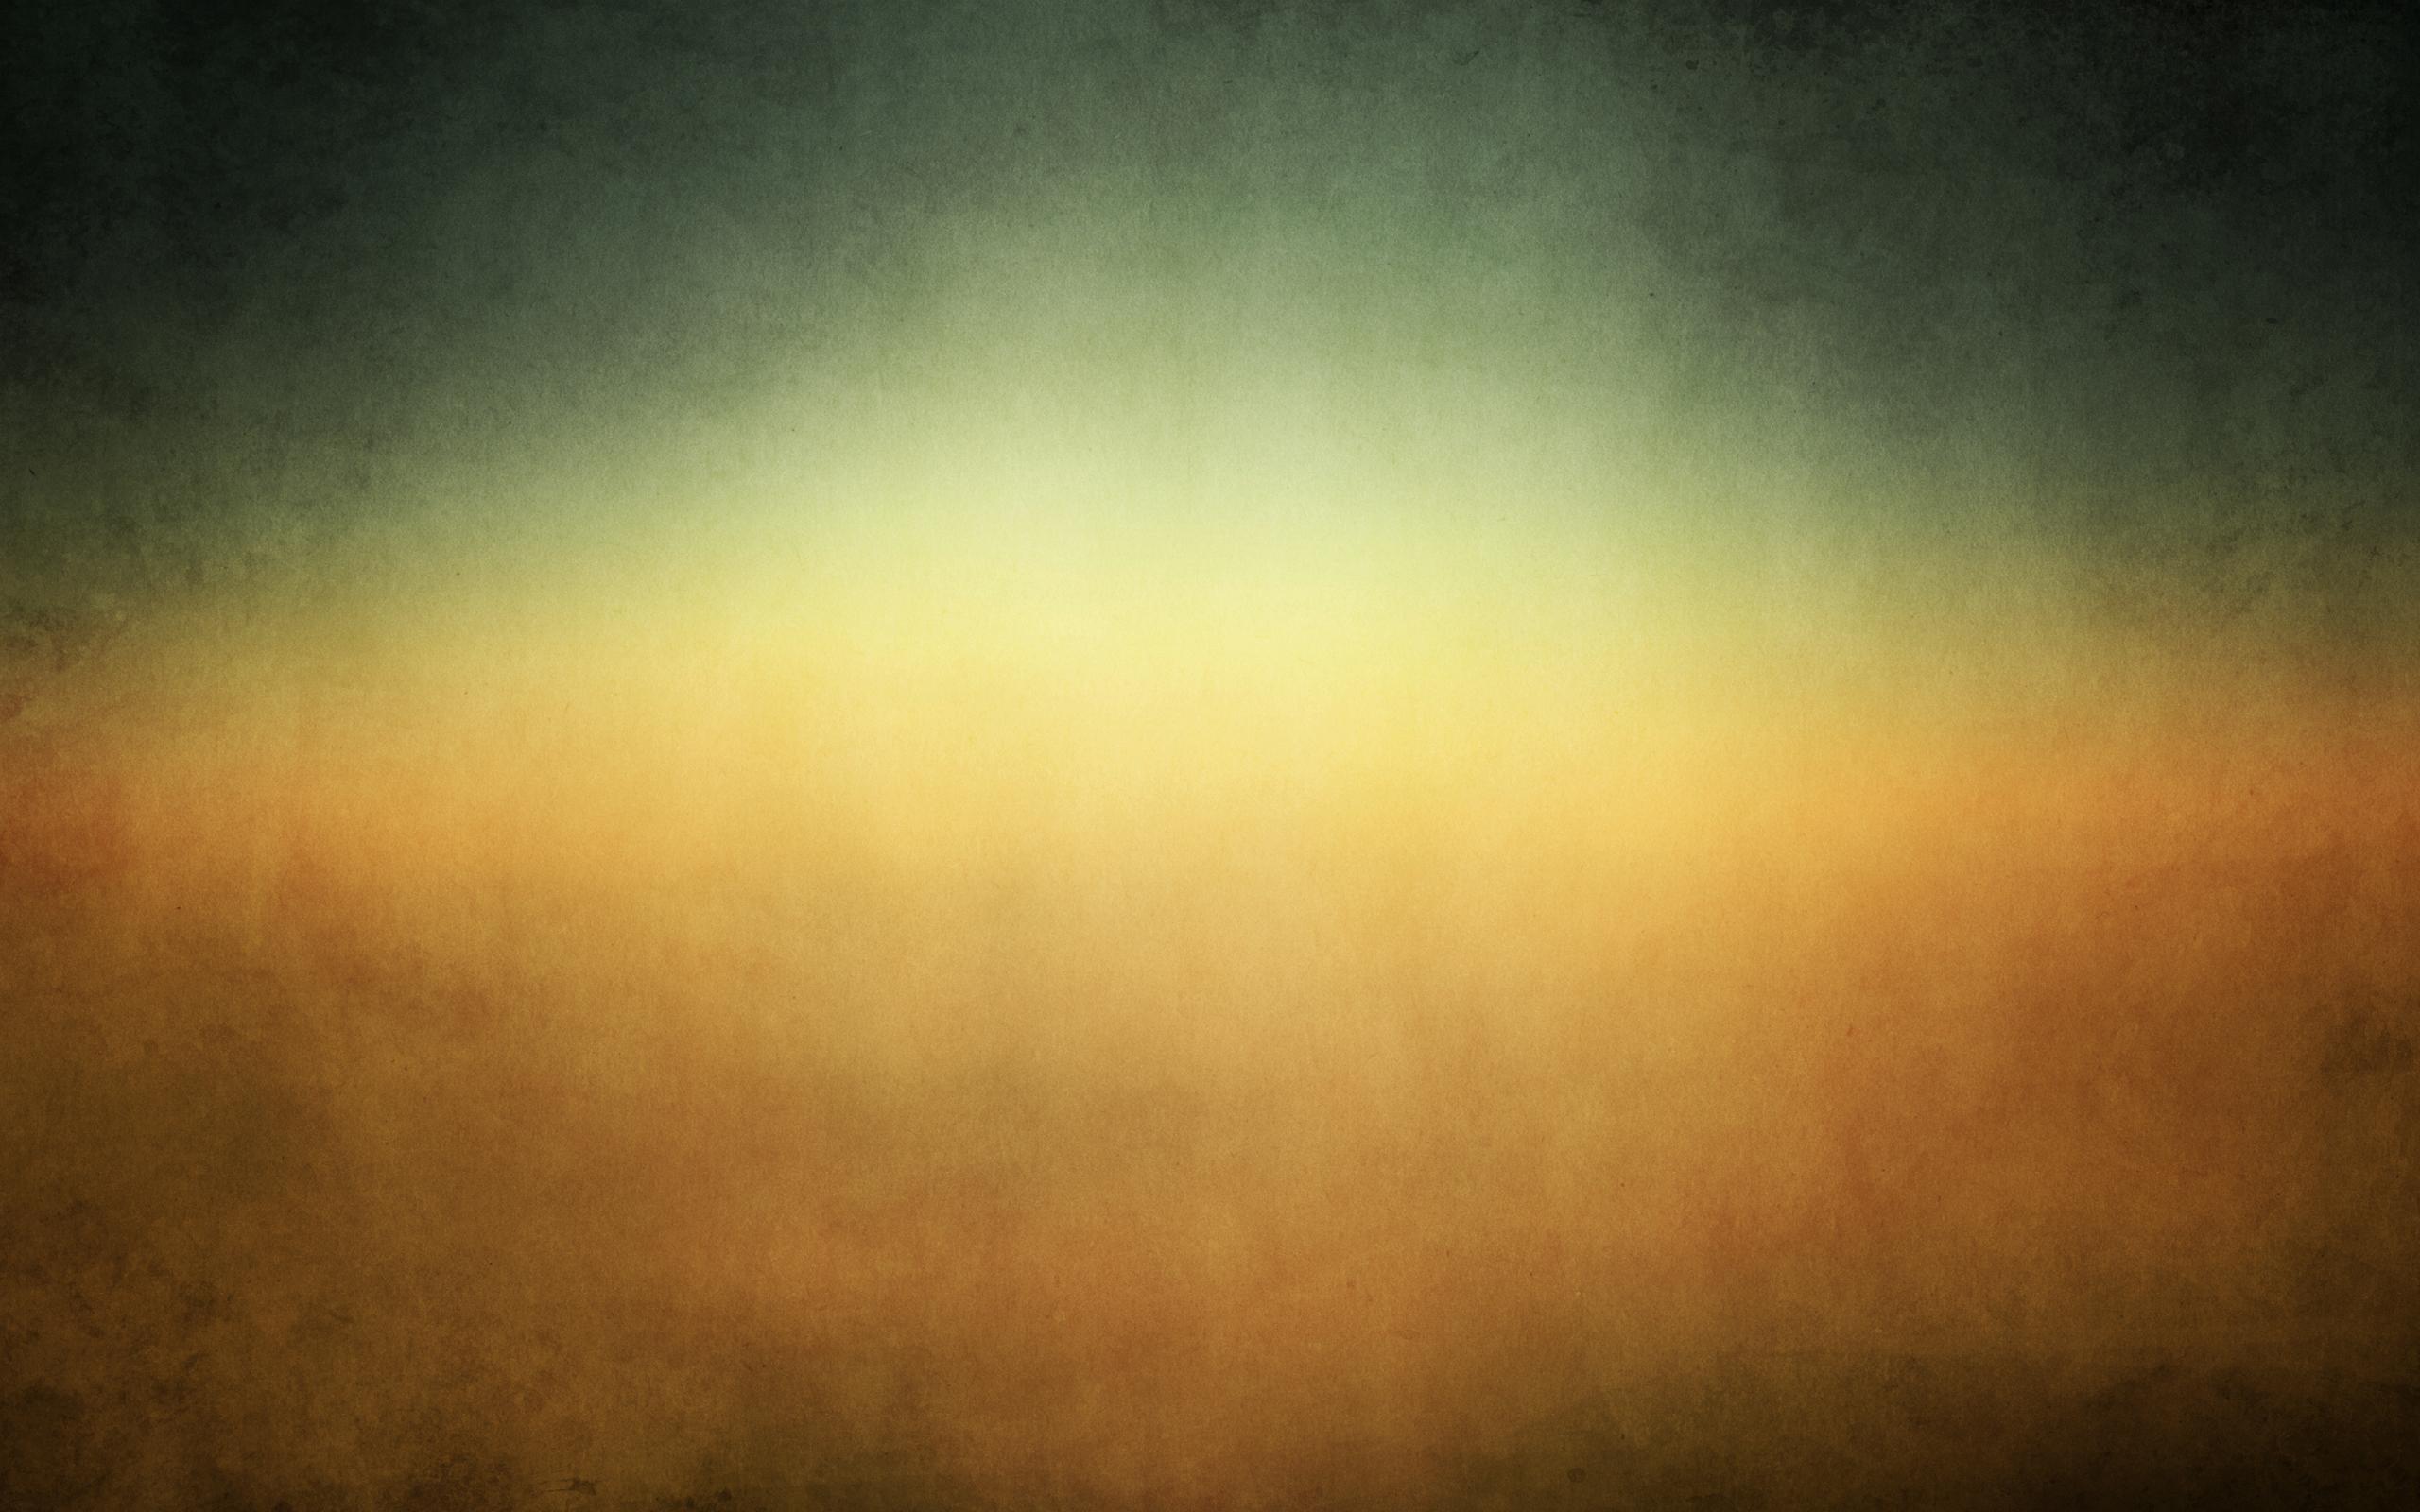 Minimalistic earth tones wallpaper 2560x1600 8572 for Dark blue and gold wallpaper